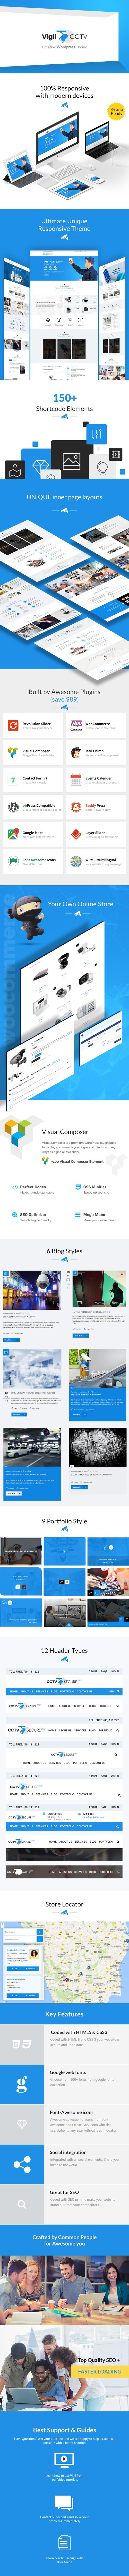 Vigil - CCTV, Security WordPress Theme - 1